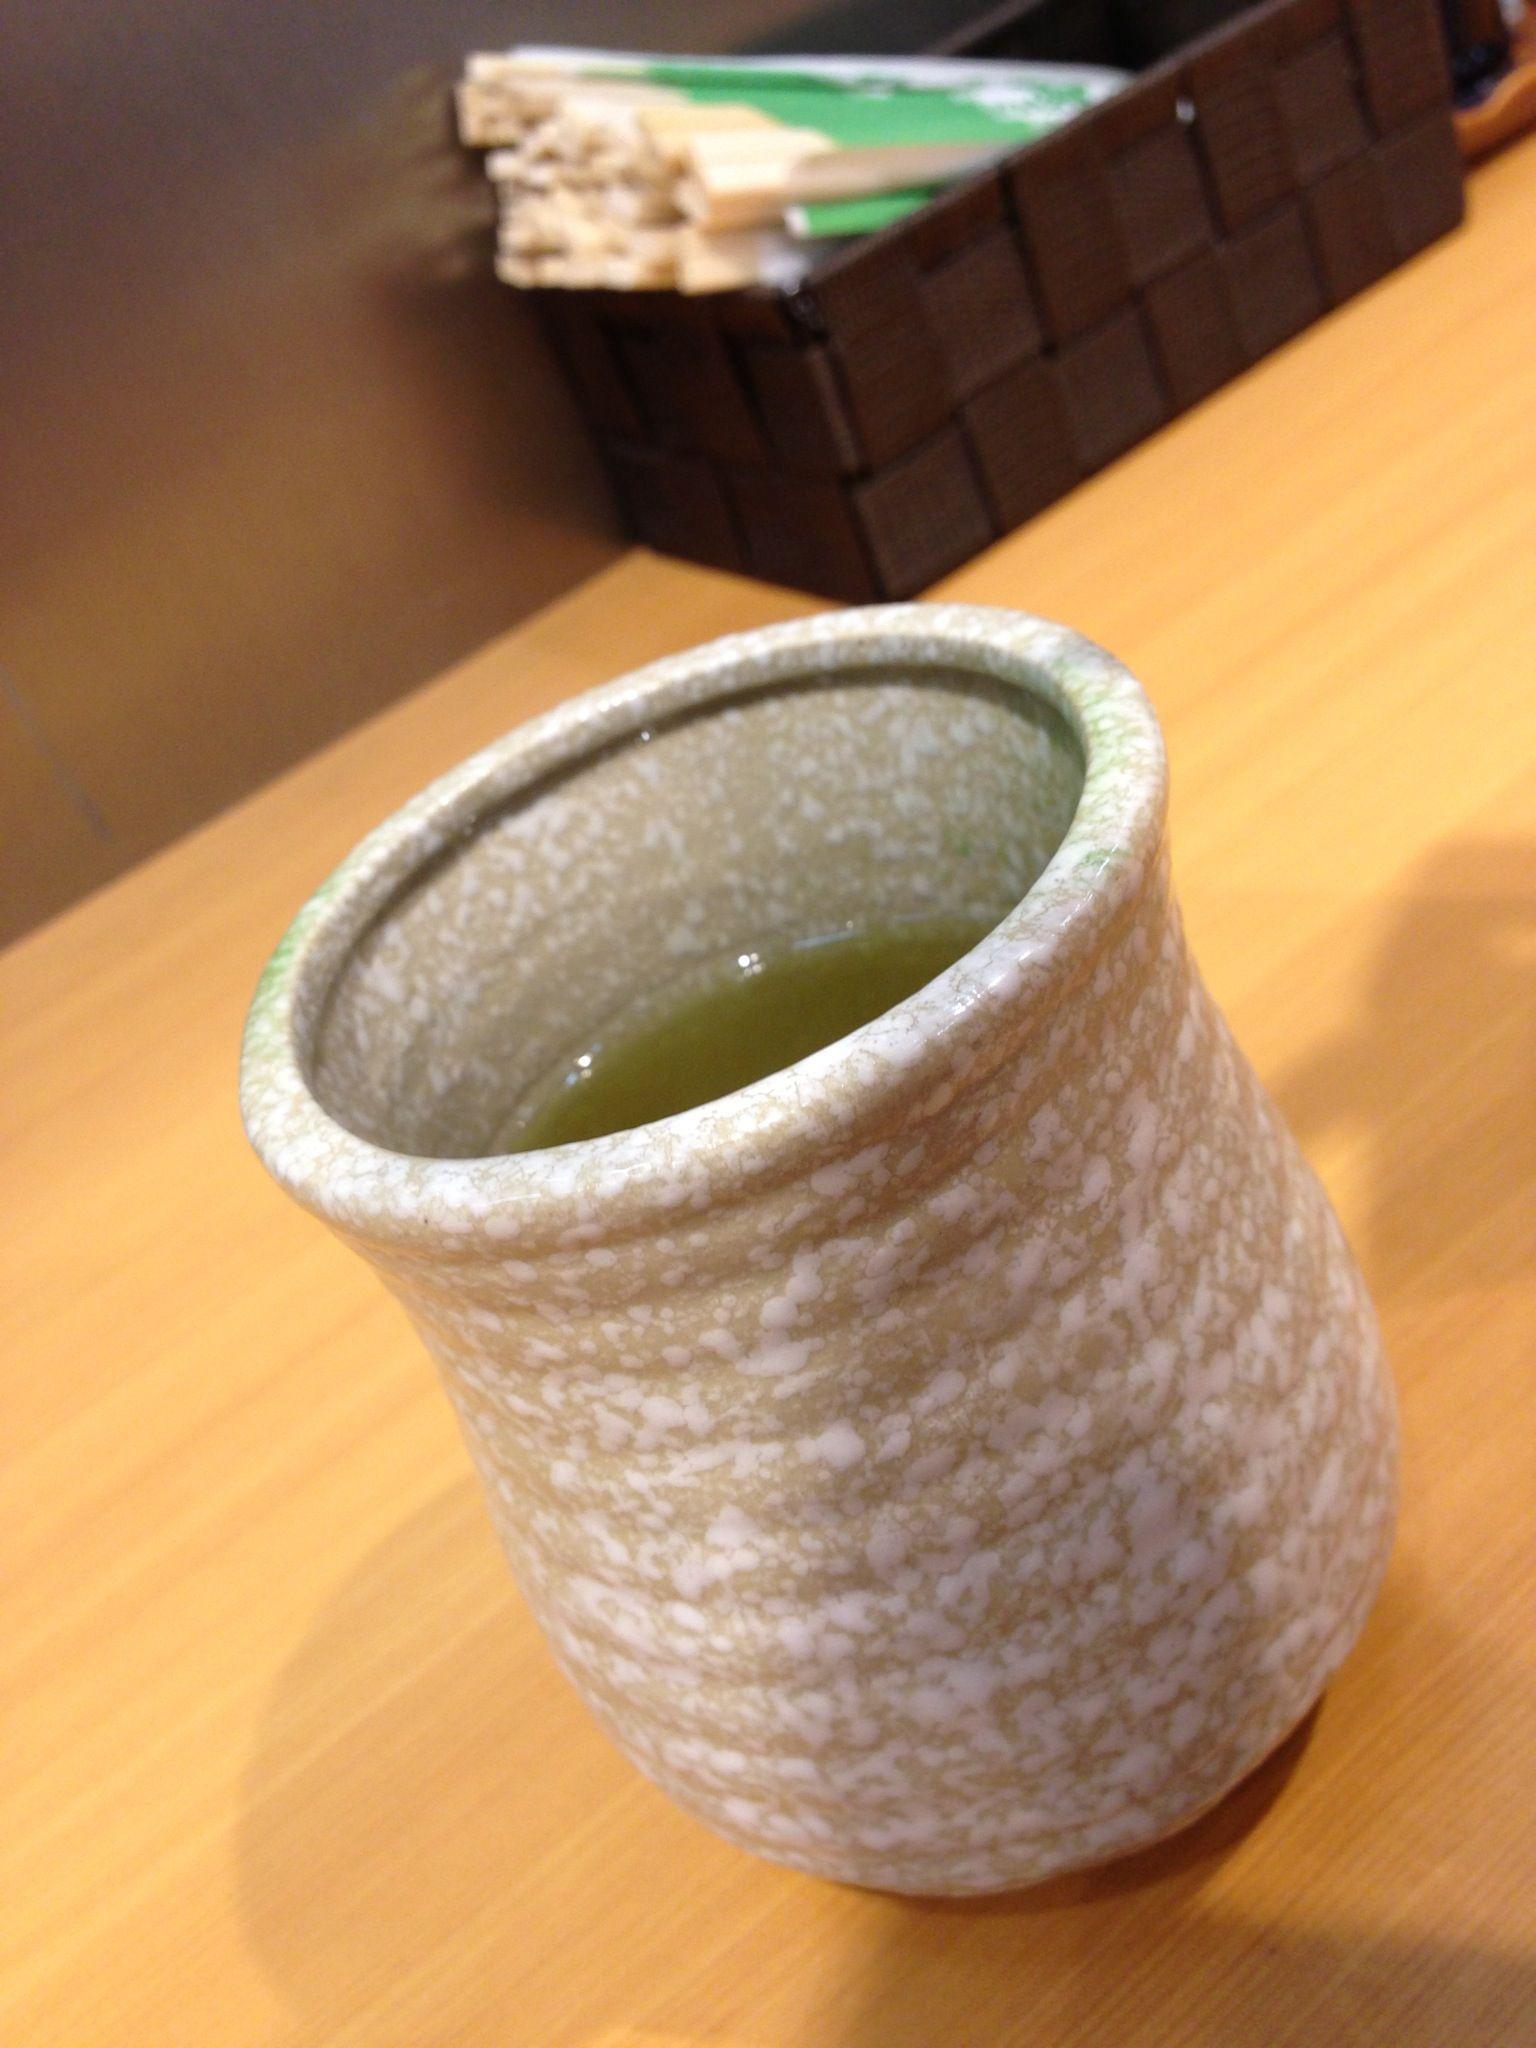 Photo of Simple #Greentea #Drink